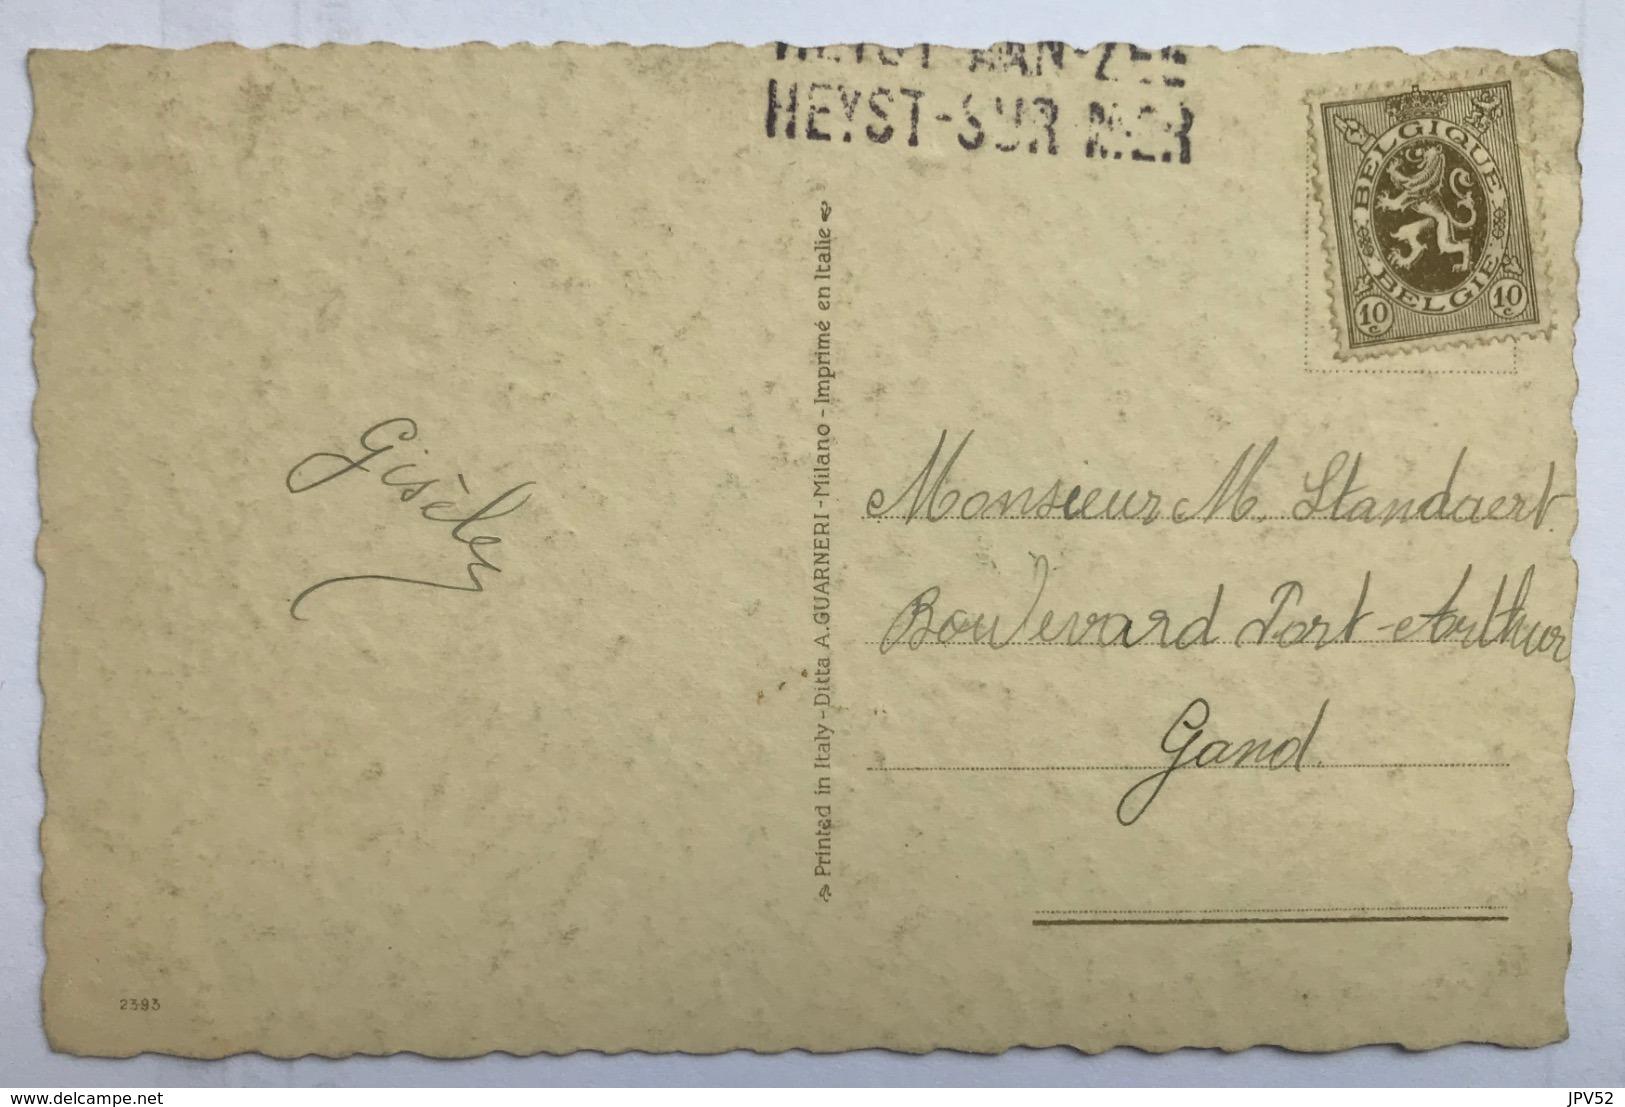 (1453) Joyeuses Pâques - Gisèle, Het Herderinnetje Met Lammeren  - 1912 - Ostern